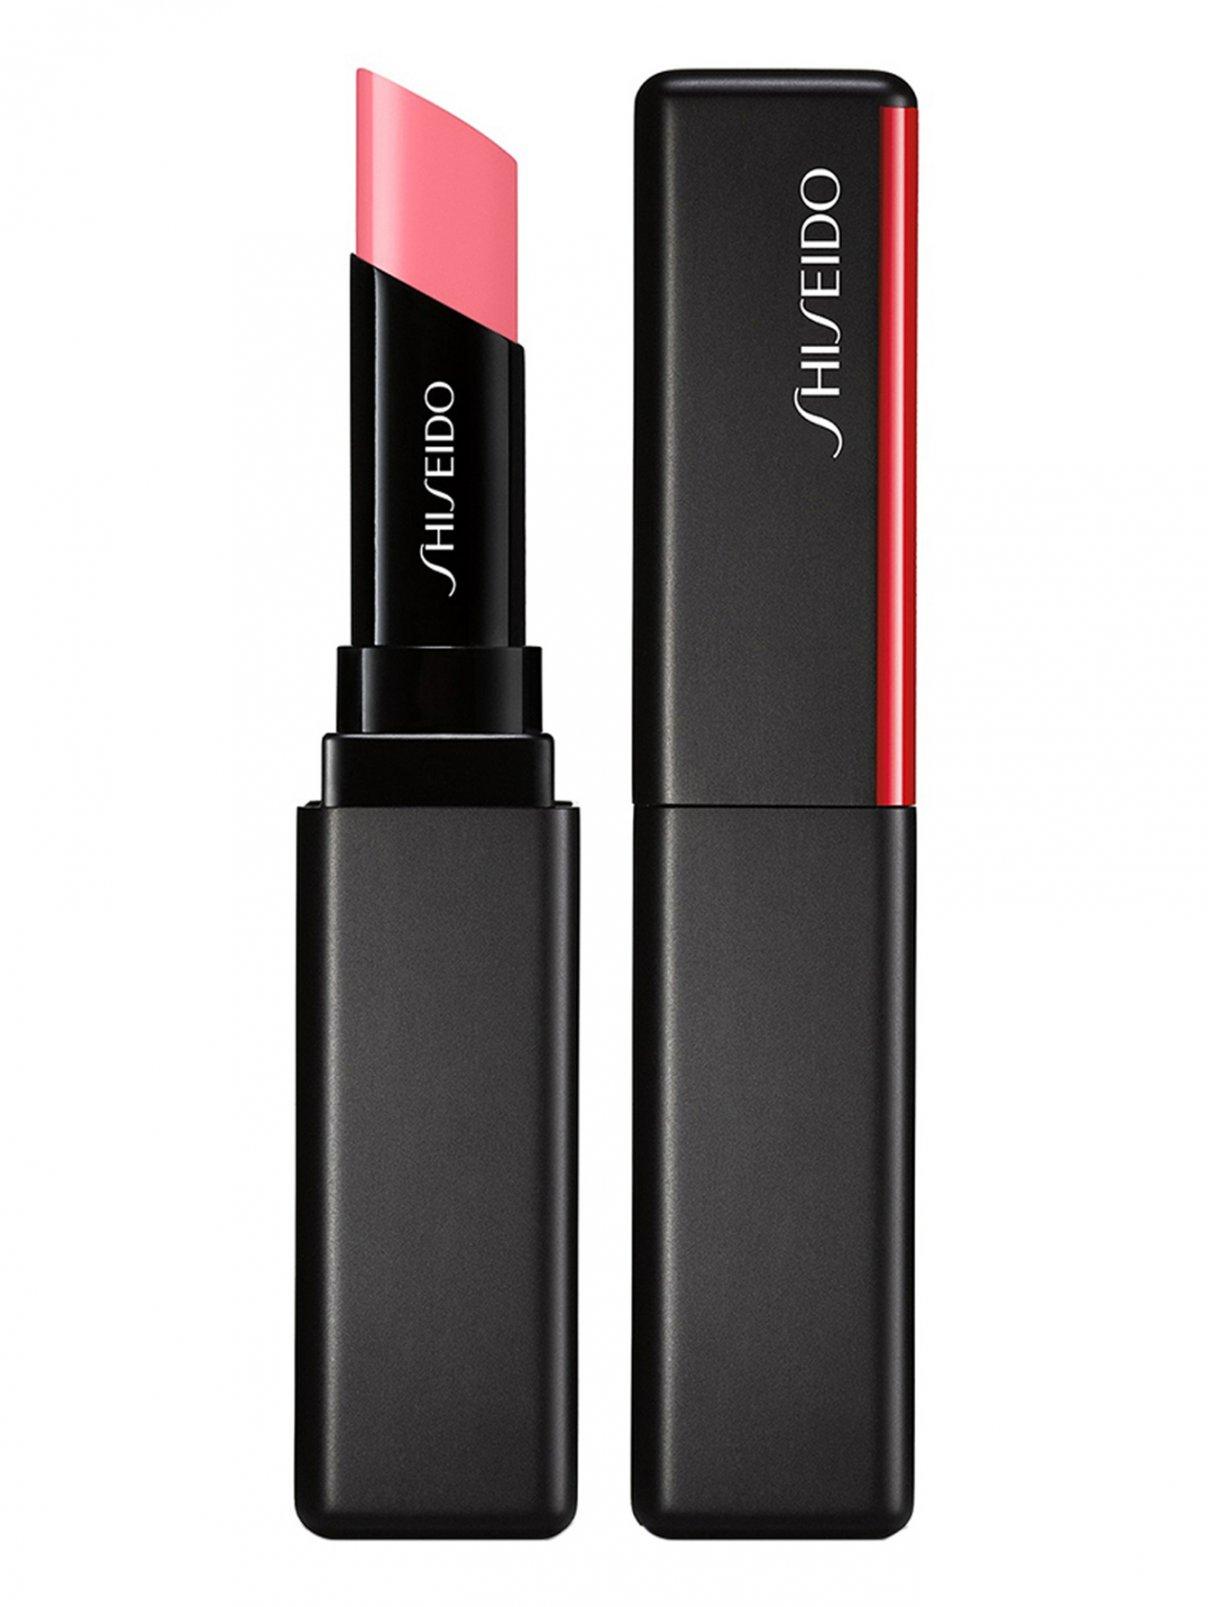 SHISEIDO Тинт-бальзам для губ ColorGel, 103 PEONY, 4 г Shiseido  –  Общий вид